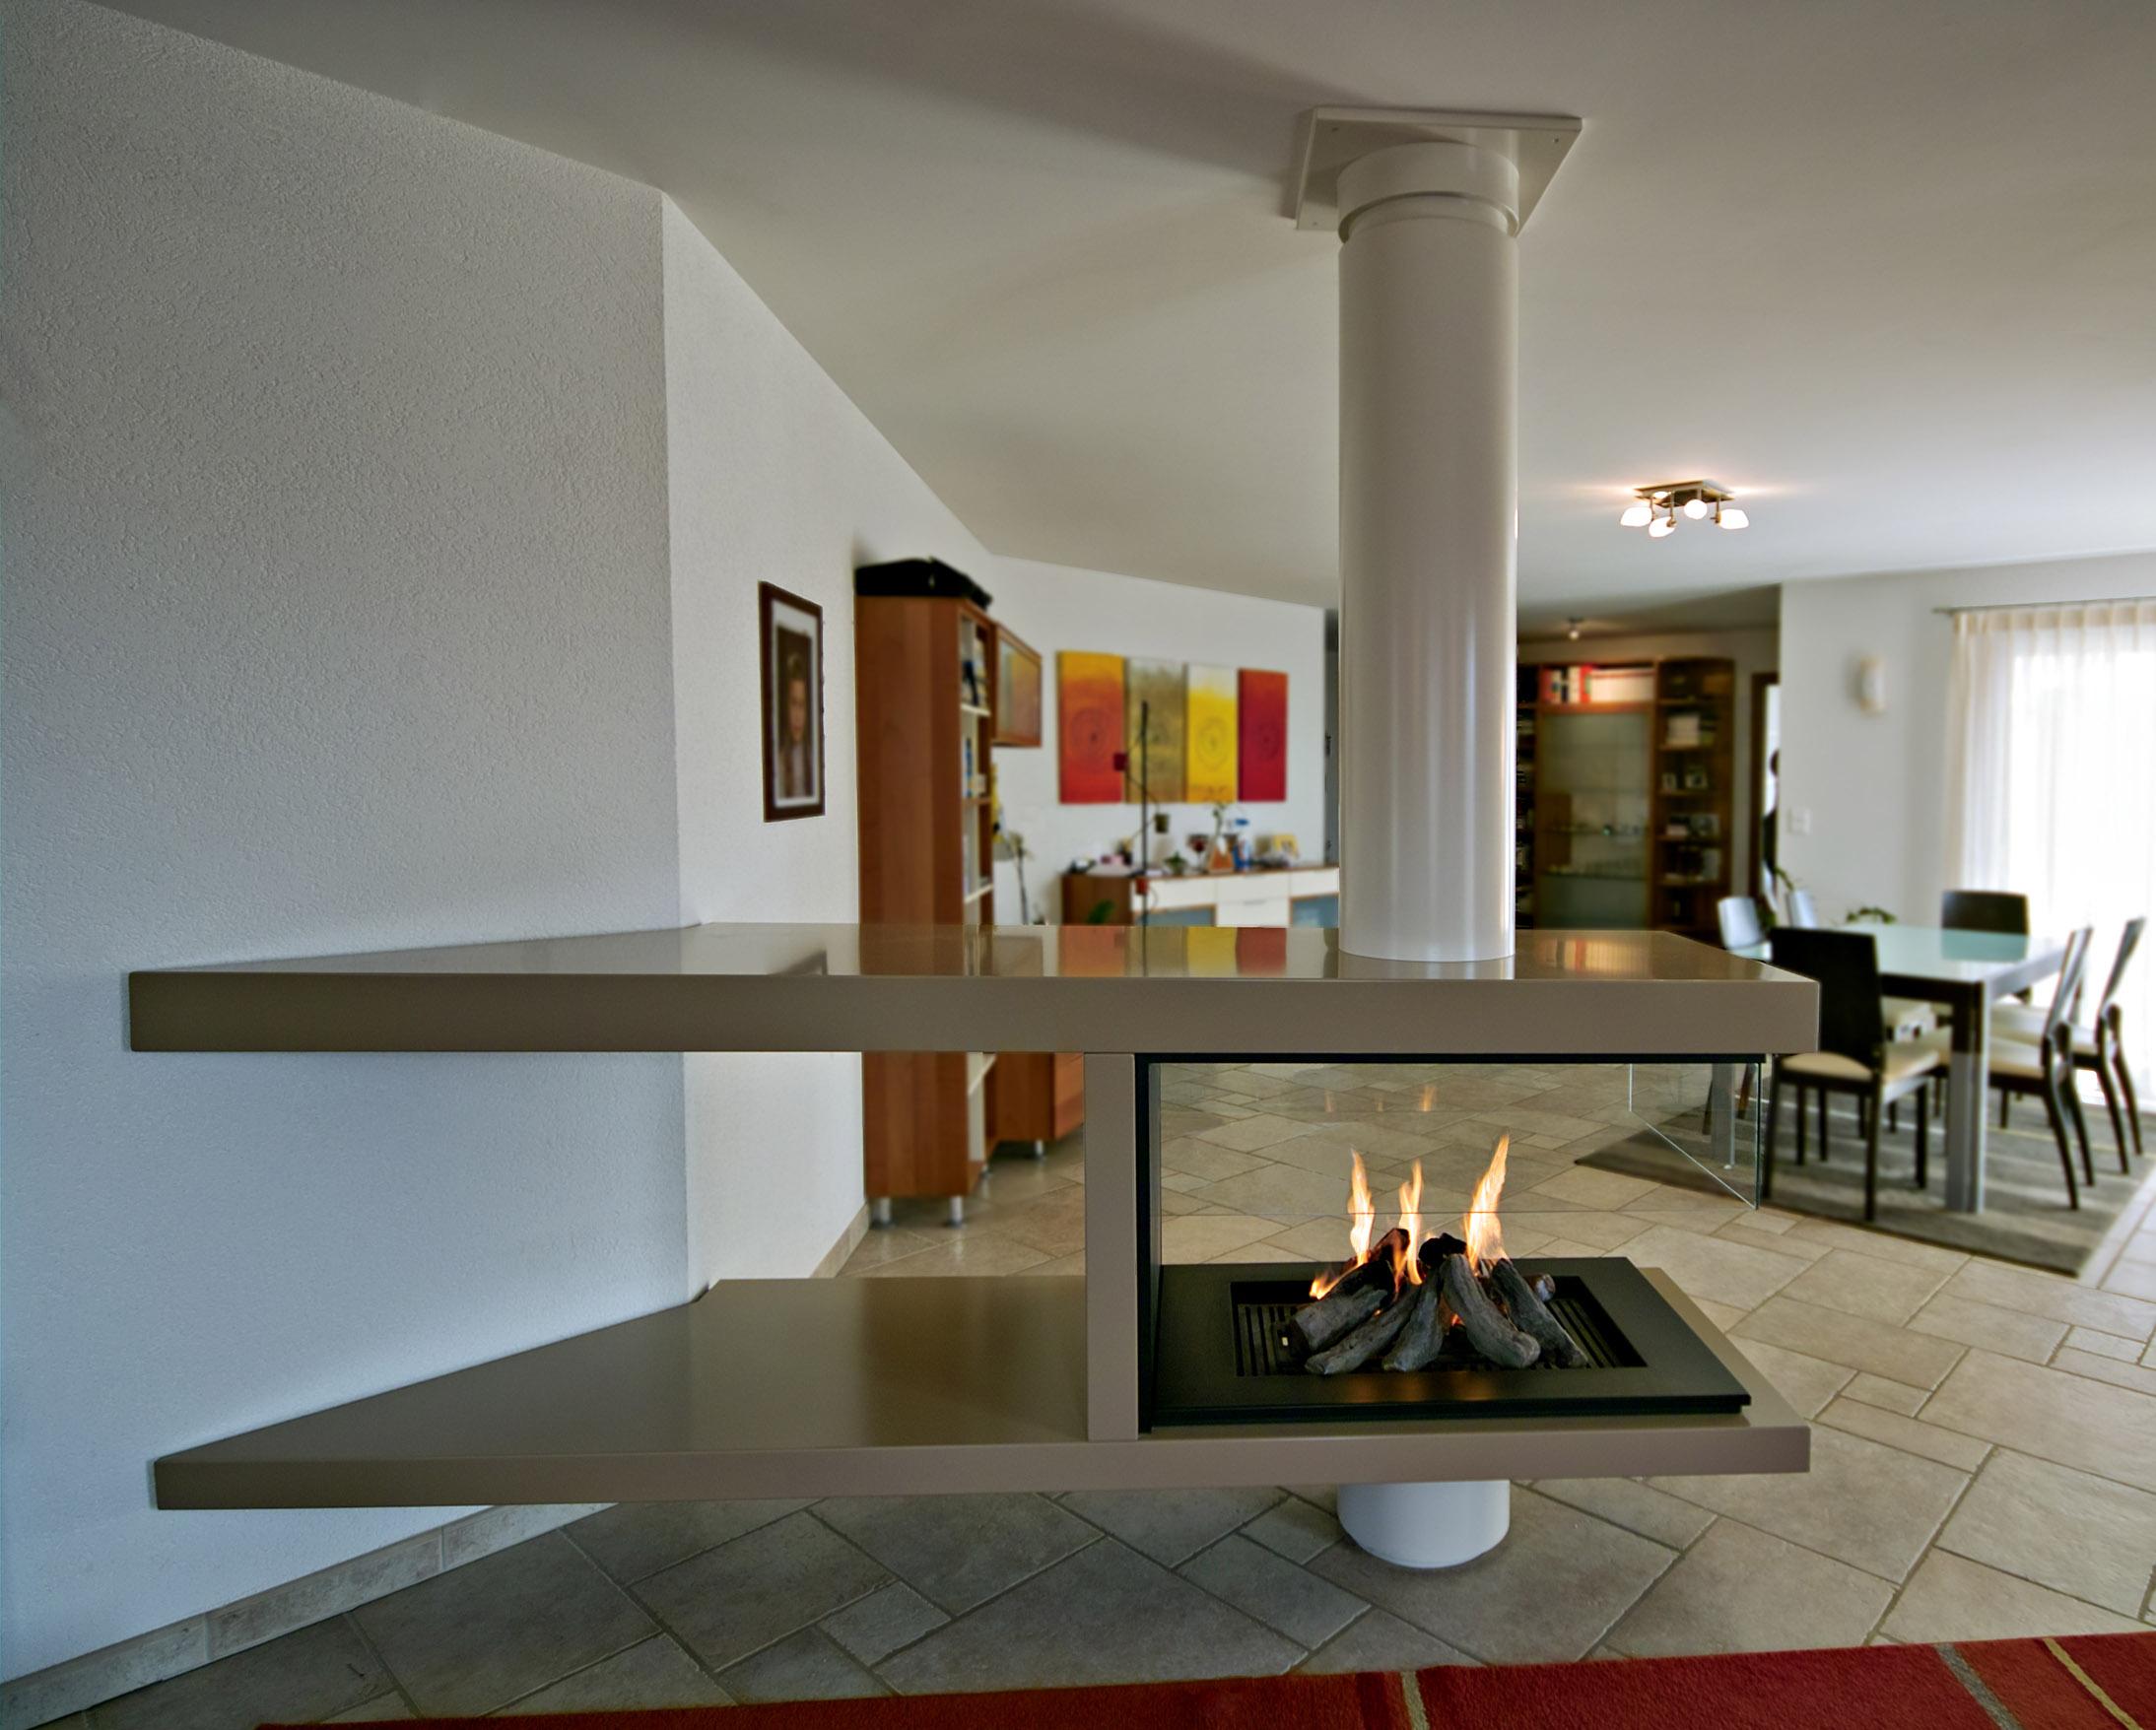 freistehender kamin stehende kamine stehen kamin. Black Bedroom Furniture Sets. Home Design Ideas